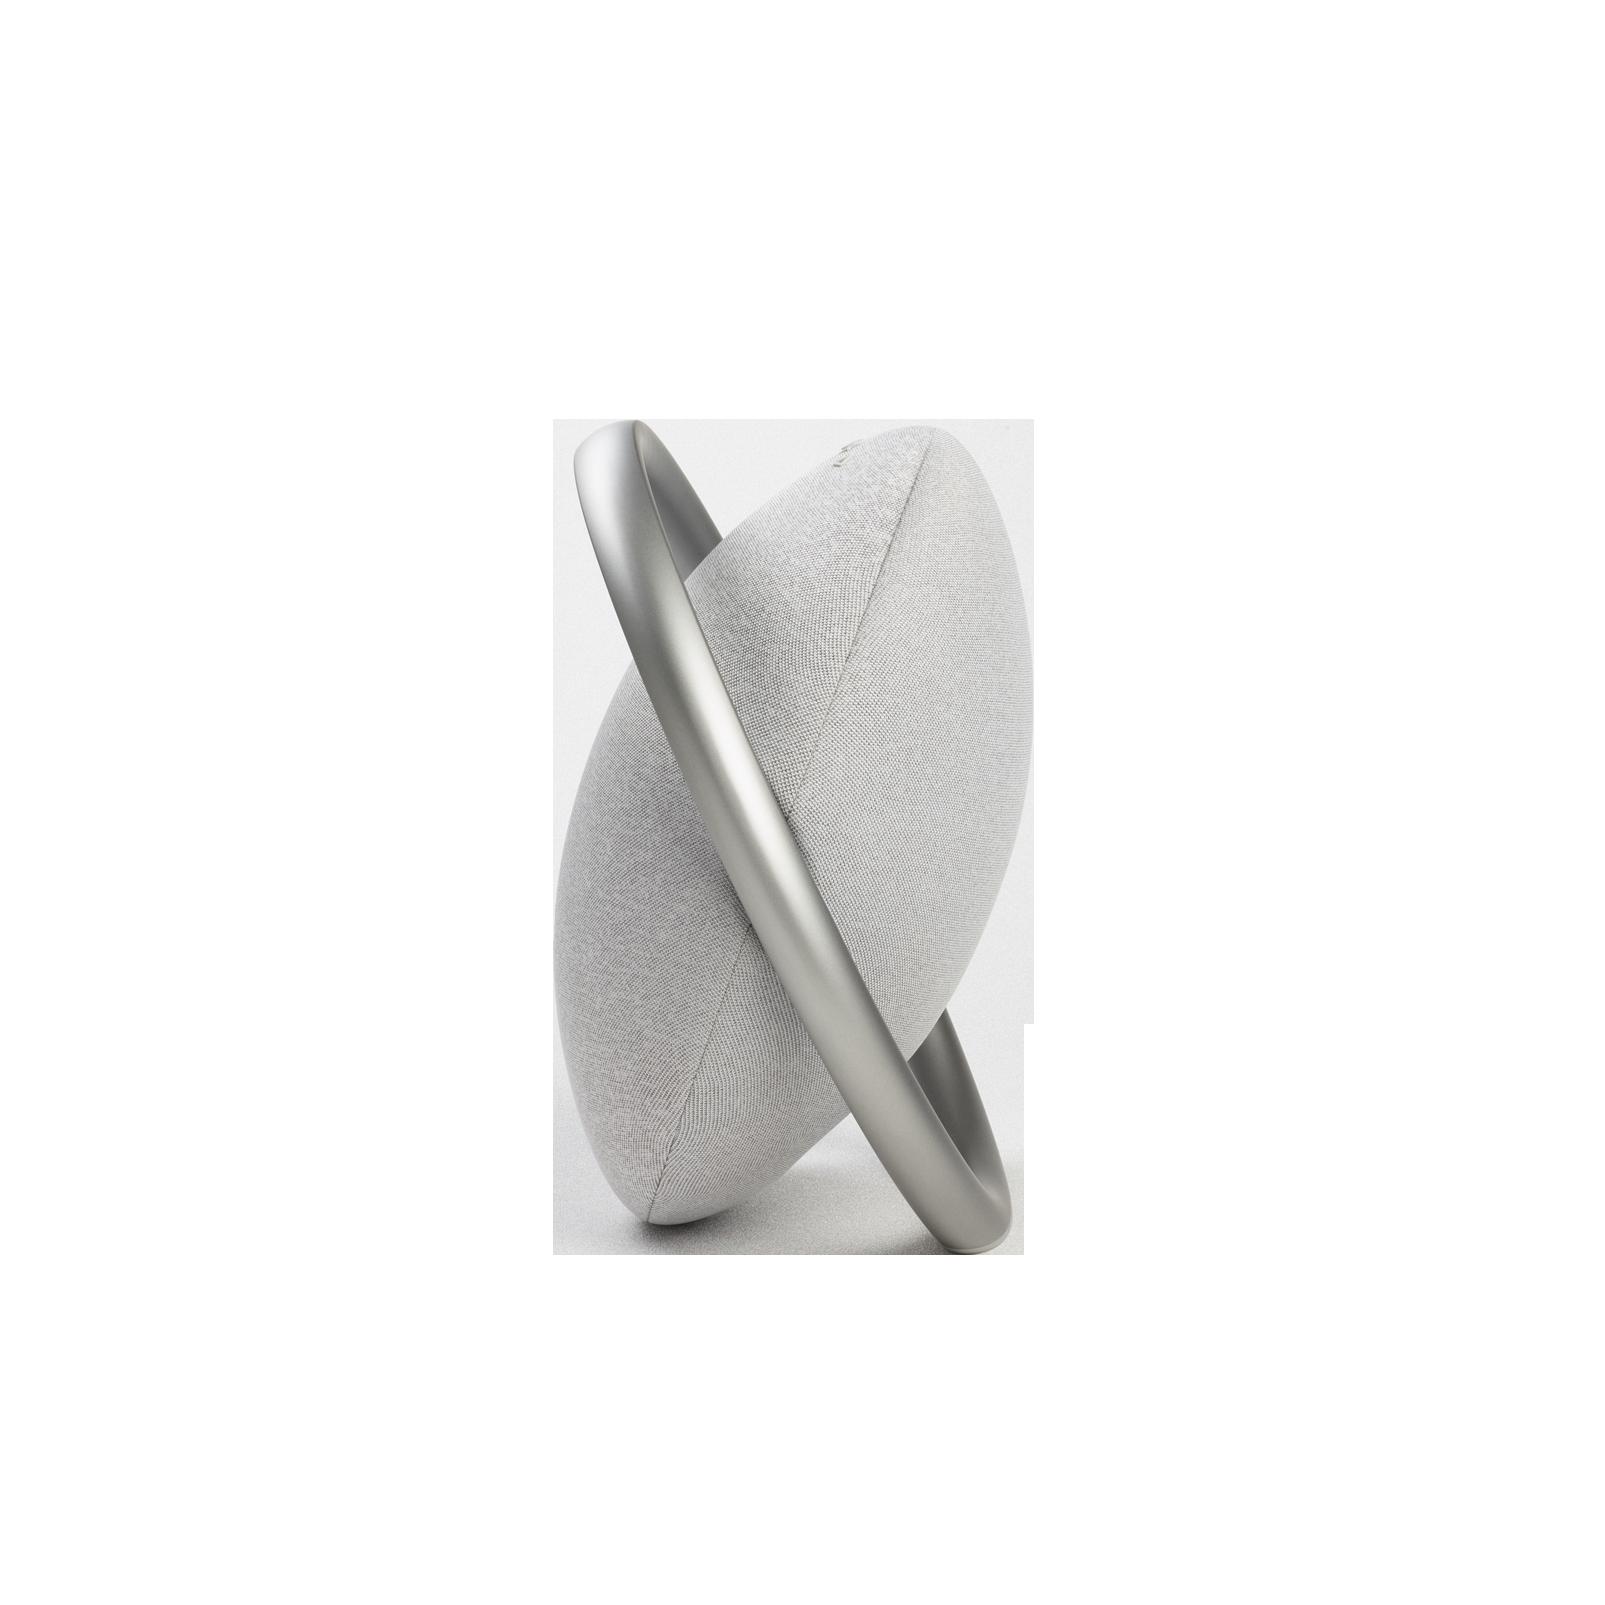 Onyx Studio 7 - Grey - Portable Stereo Bluetooth Speaker - Left